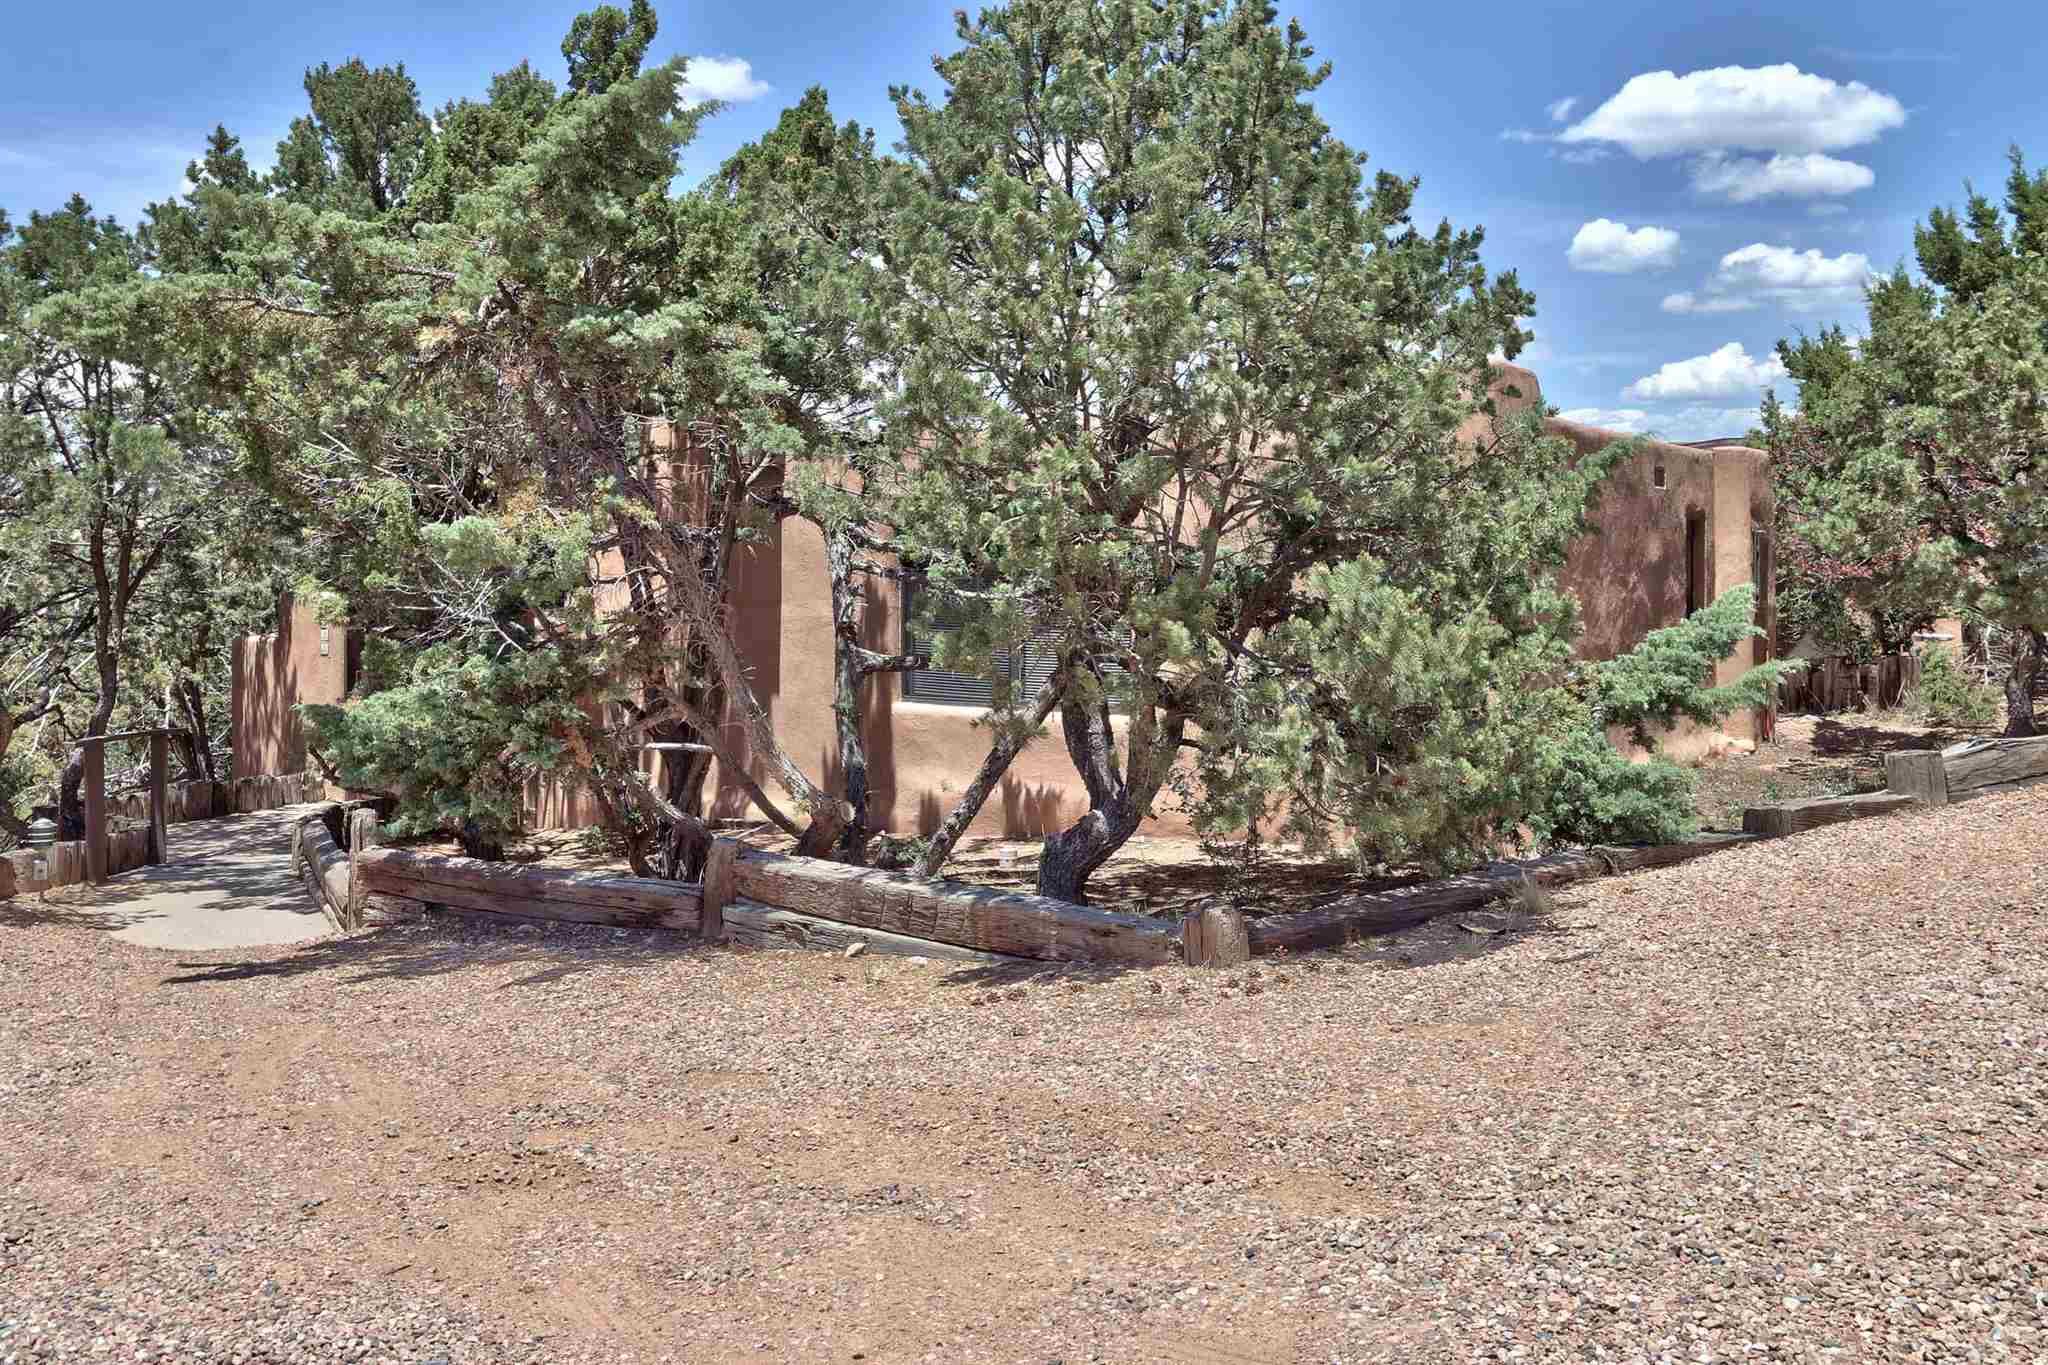 320 CALLE LOMA NORTE, Santa Fe, New Mexico 87501, 1 Bedroom Bedrooms, ,1 BathroomBathrooms,Condominium,For Sale,320 CALLE LOMA NORTE,202005108